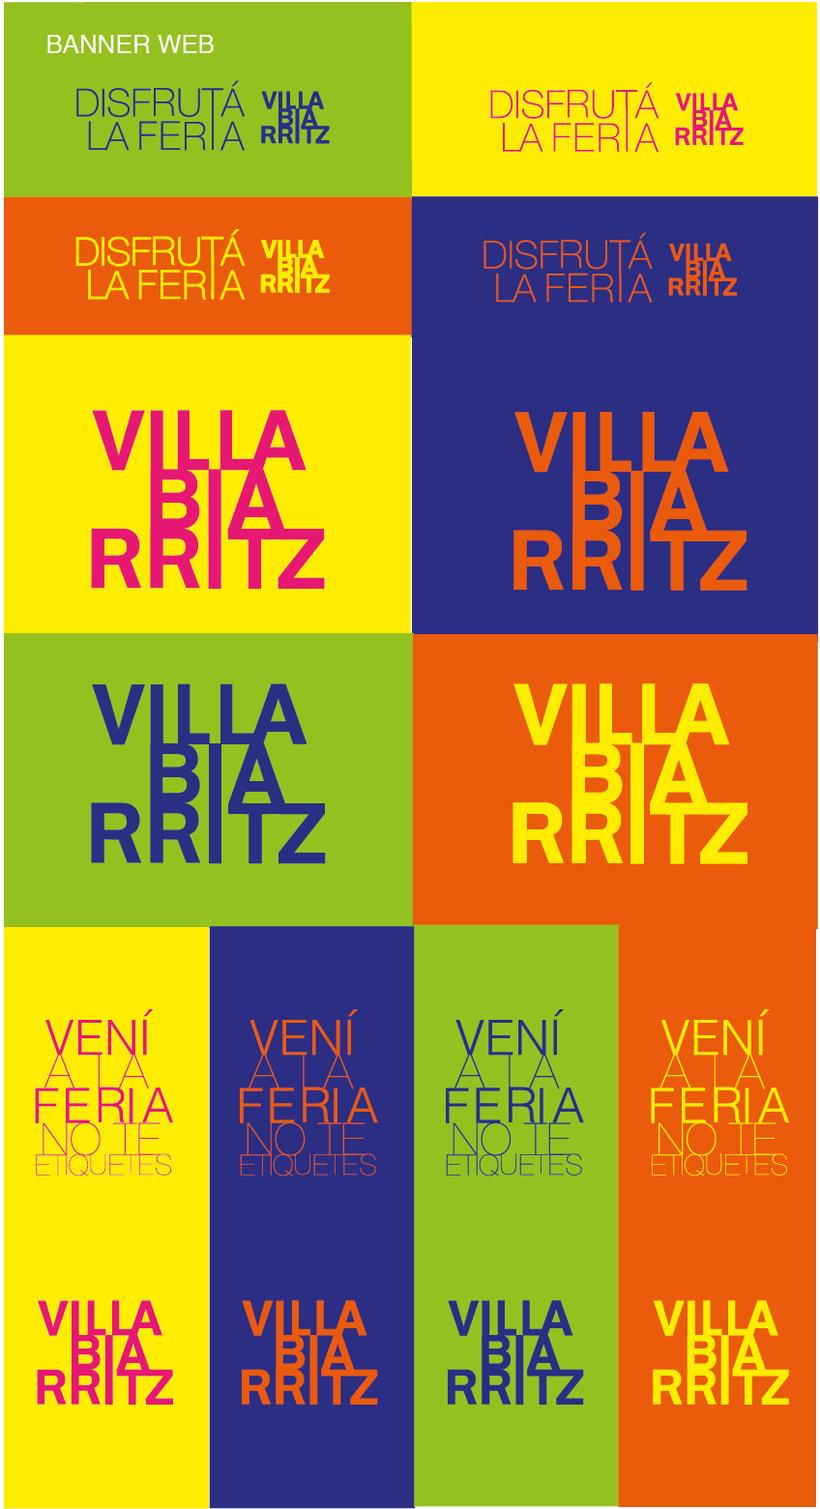 Feria de Villa Biarritz 4